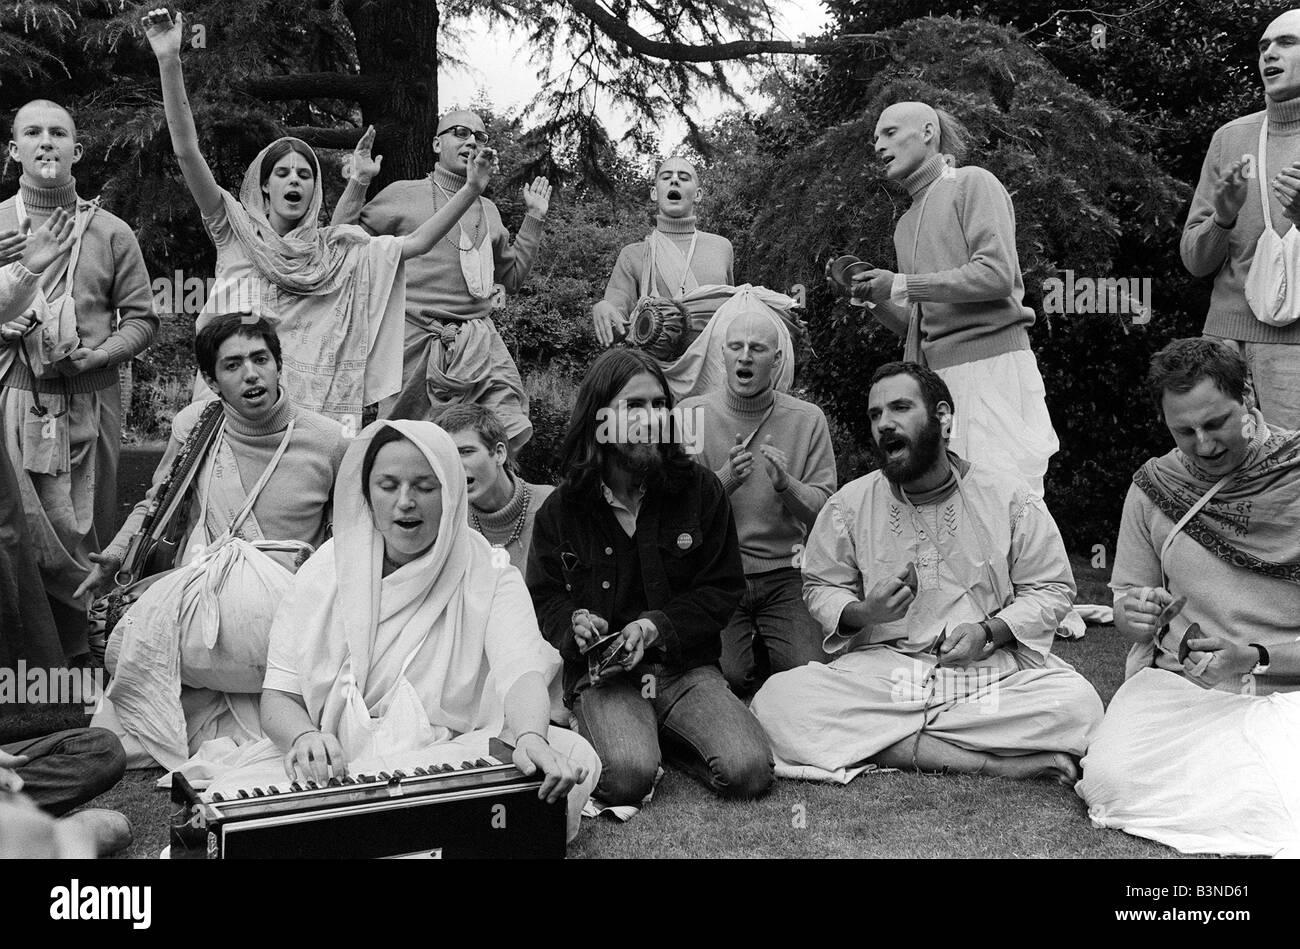 George Harrison Radha Krishna Temple August 1969 George with members of the 12 strong Radha Krishna Temple at a - Stock Image